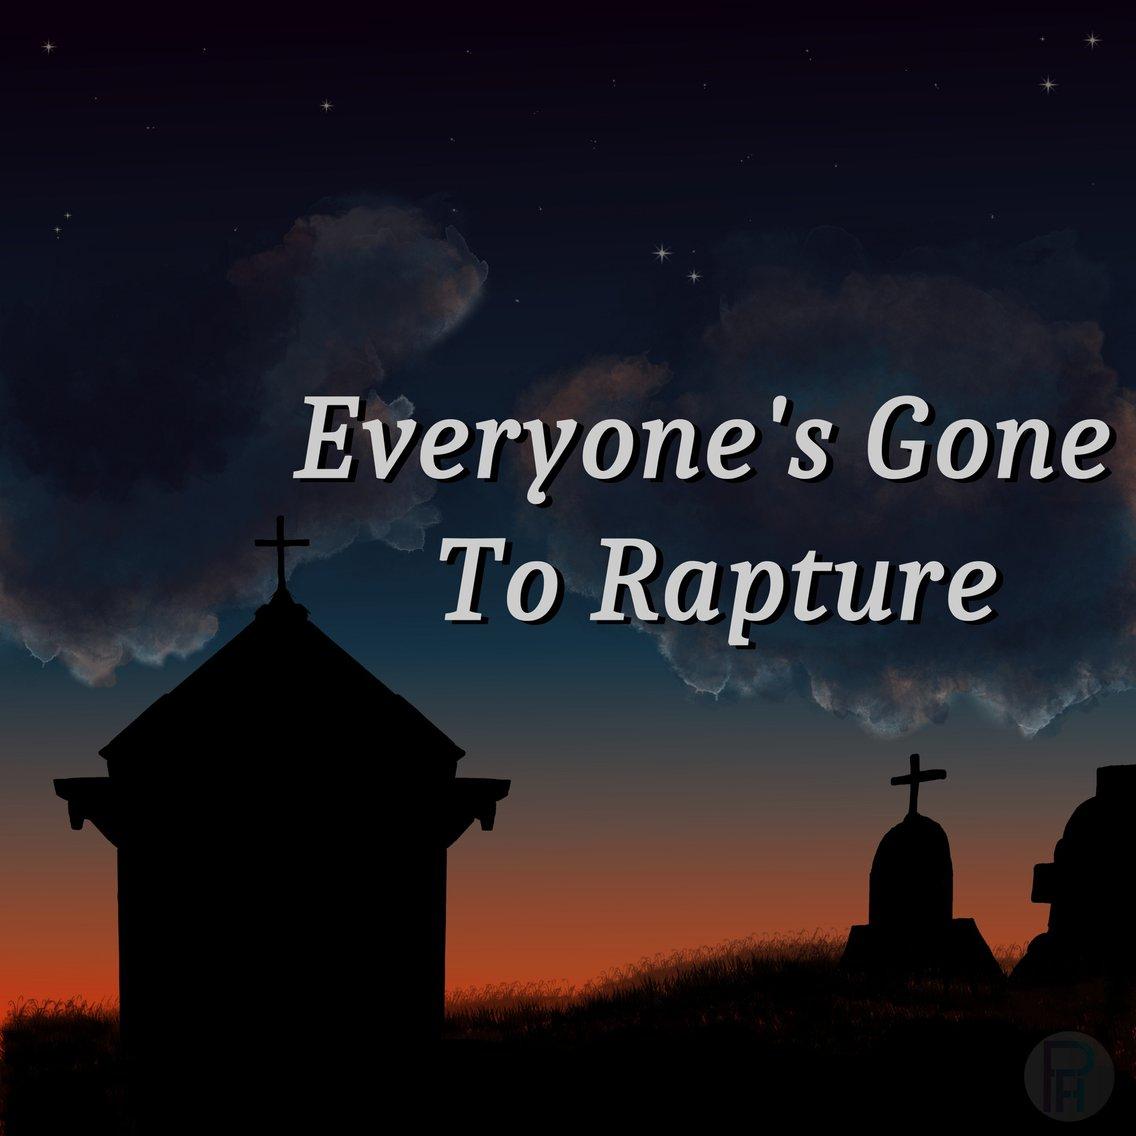 Everyone's Gone To Rapture - imagen de portada